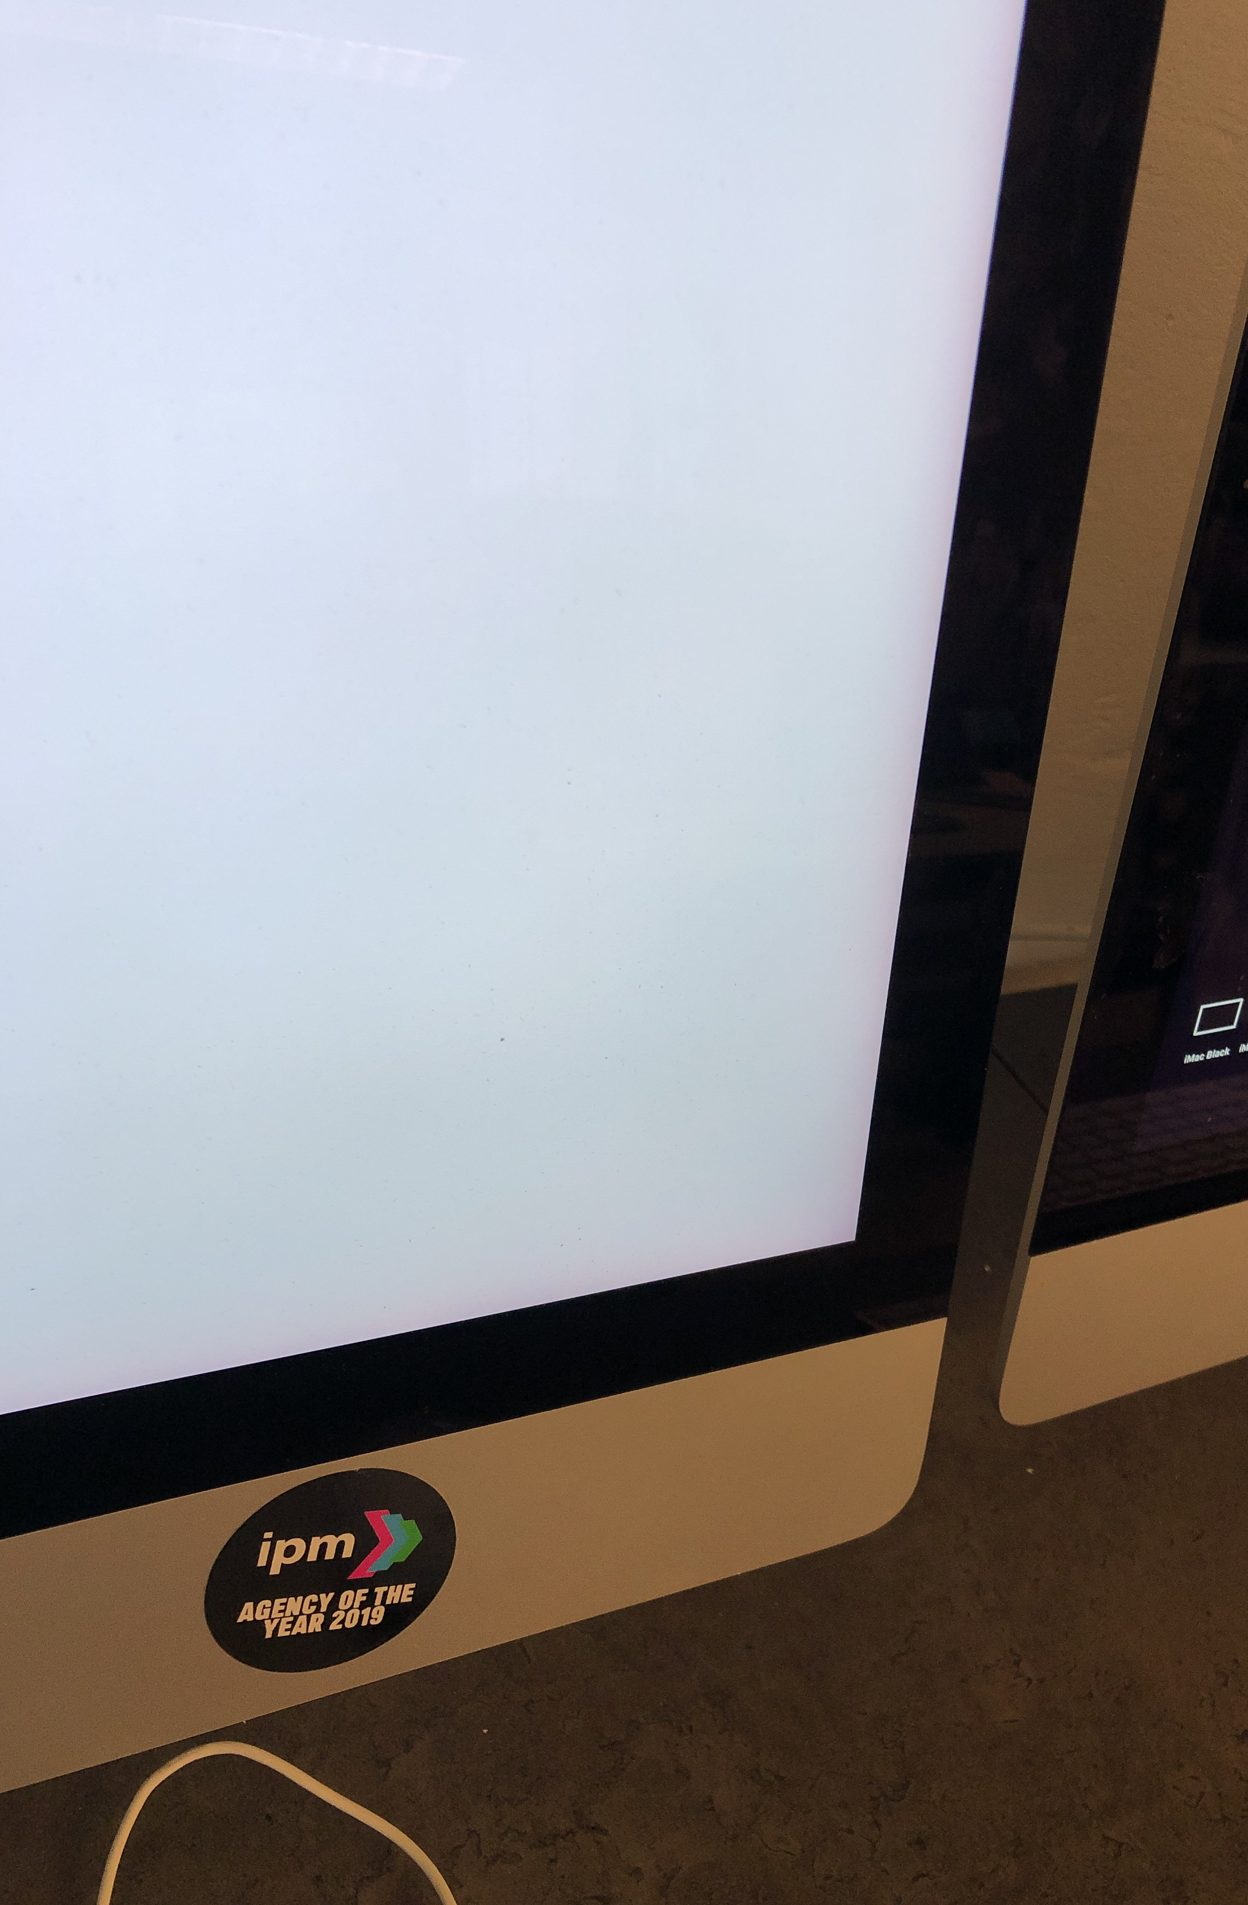 "iMac 27"" Retina 5K Late 2015 (Intel Quad-Core i7 4.0 GHz 32 GB RAM 1 TB Fusion Drive), Intel Quad-Core i7 4.0 GHz, 32 GB RAM, 1 TB Fusion Drive, Kuva 5"